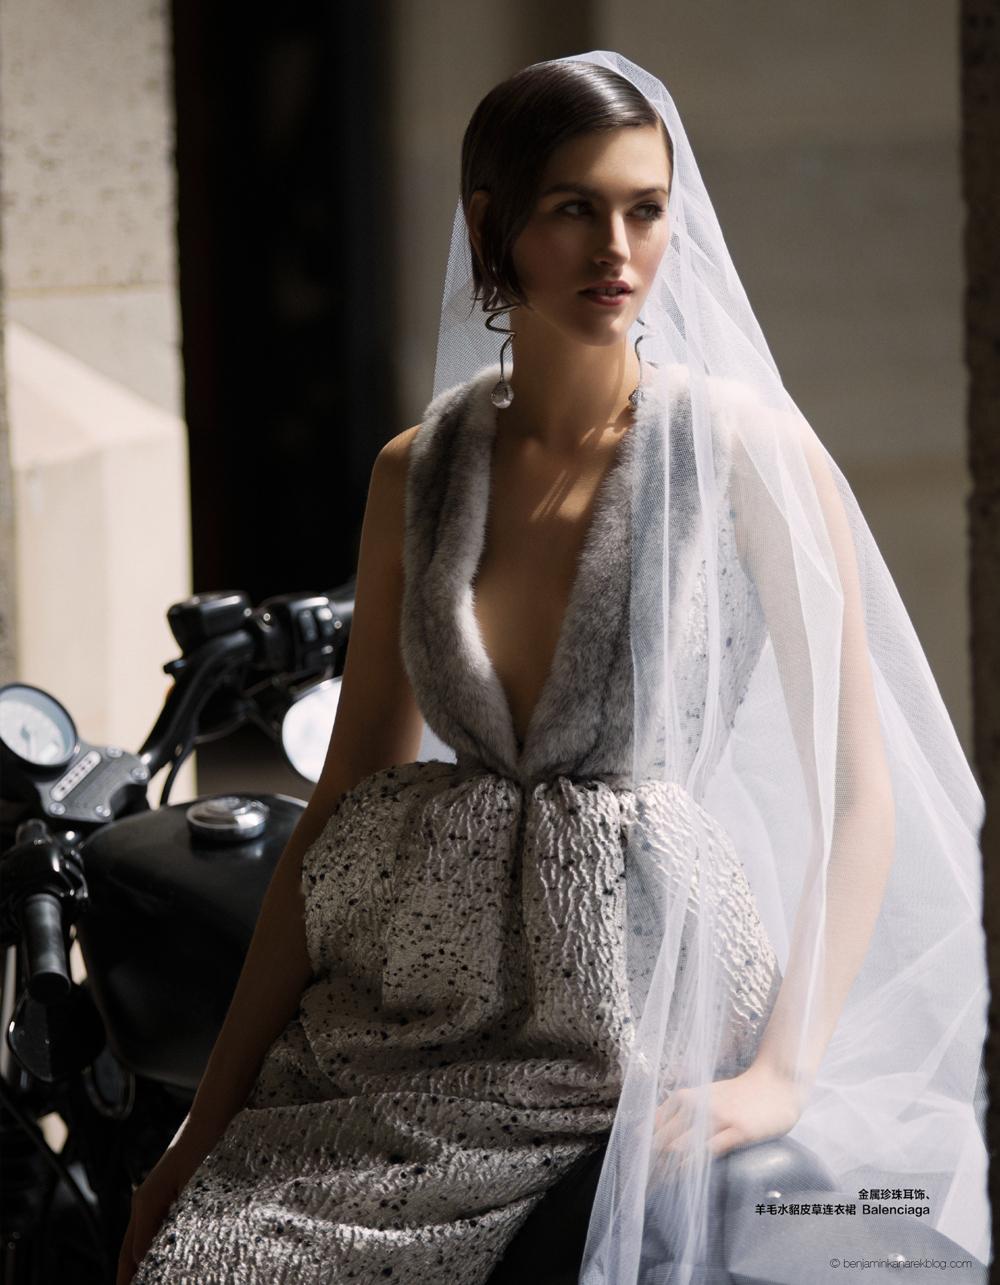 Balenciaga Fur Wedding Gown